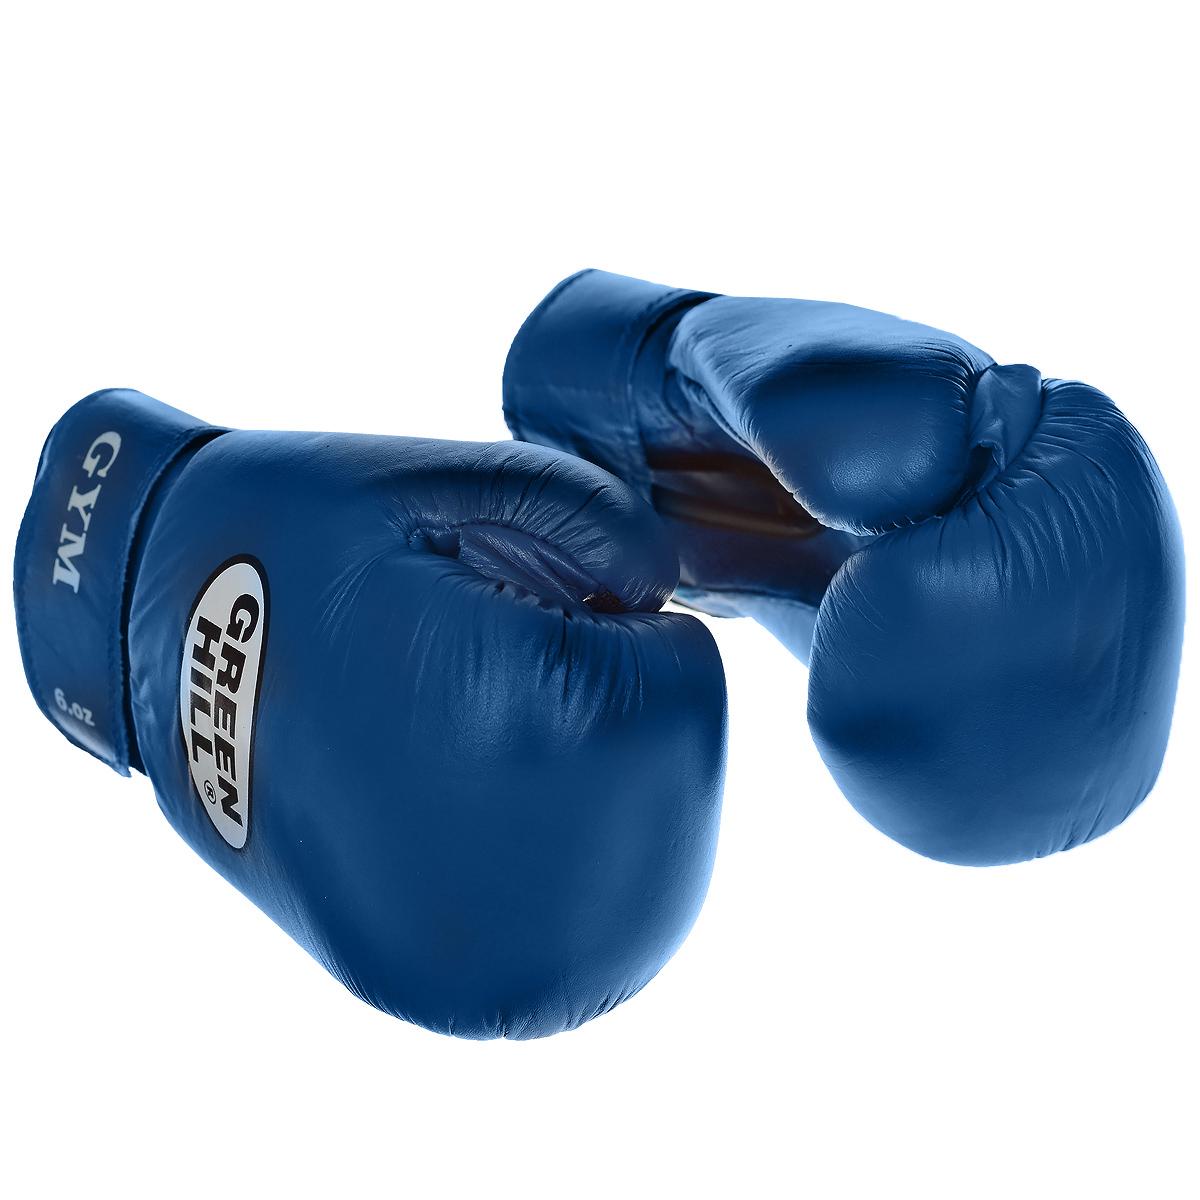 Перчатки боксерские Green Hill Gym, цвет: синий. Вес 12 унций